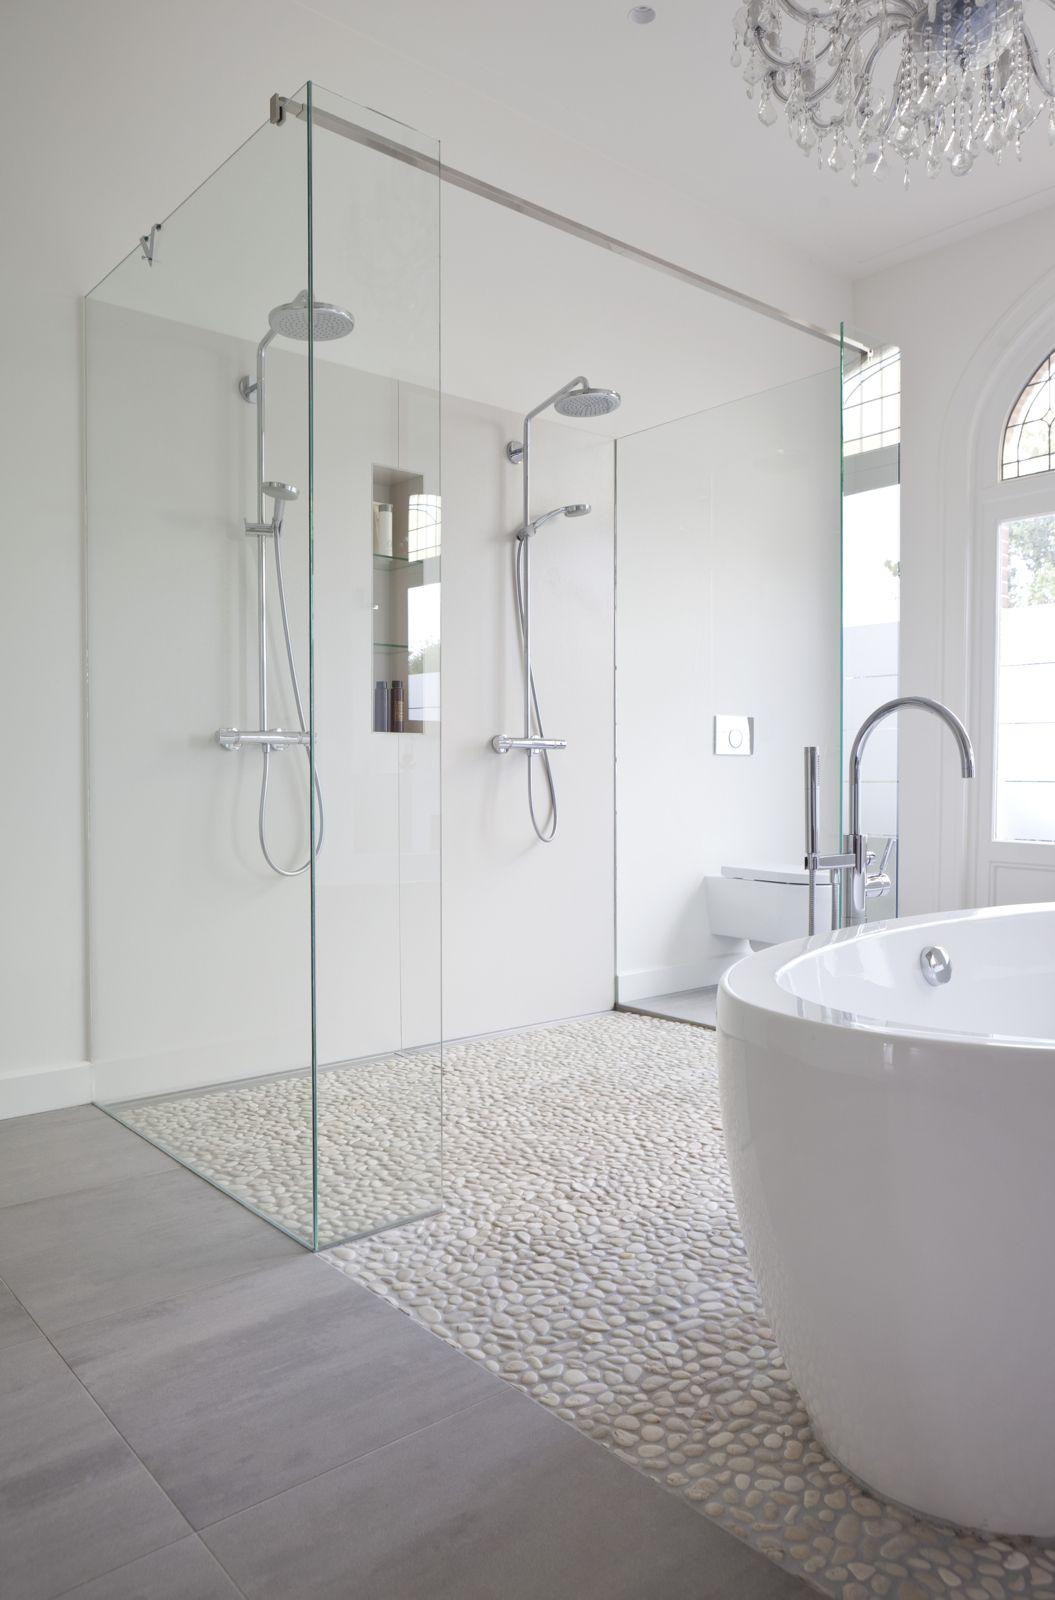 Platos de ducha de obra de piedra